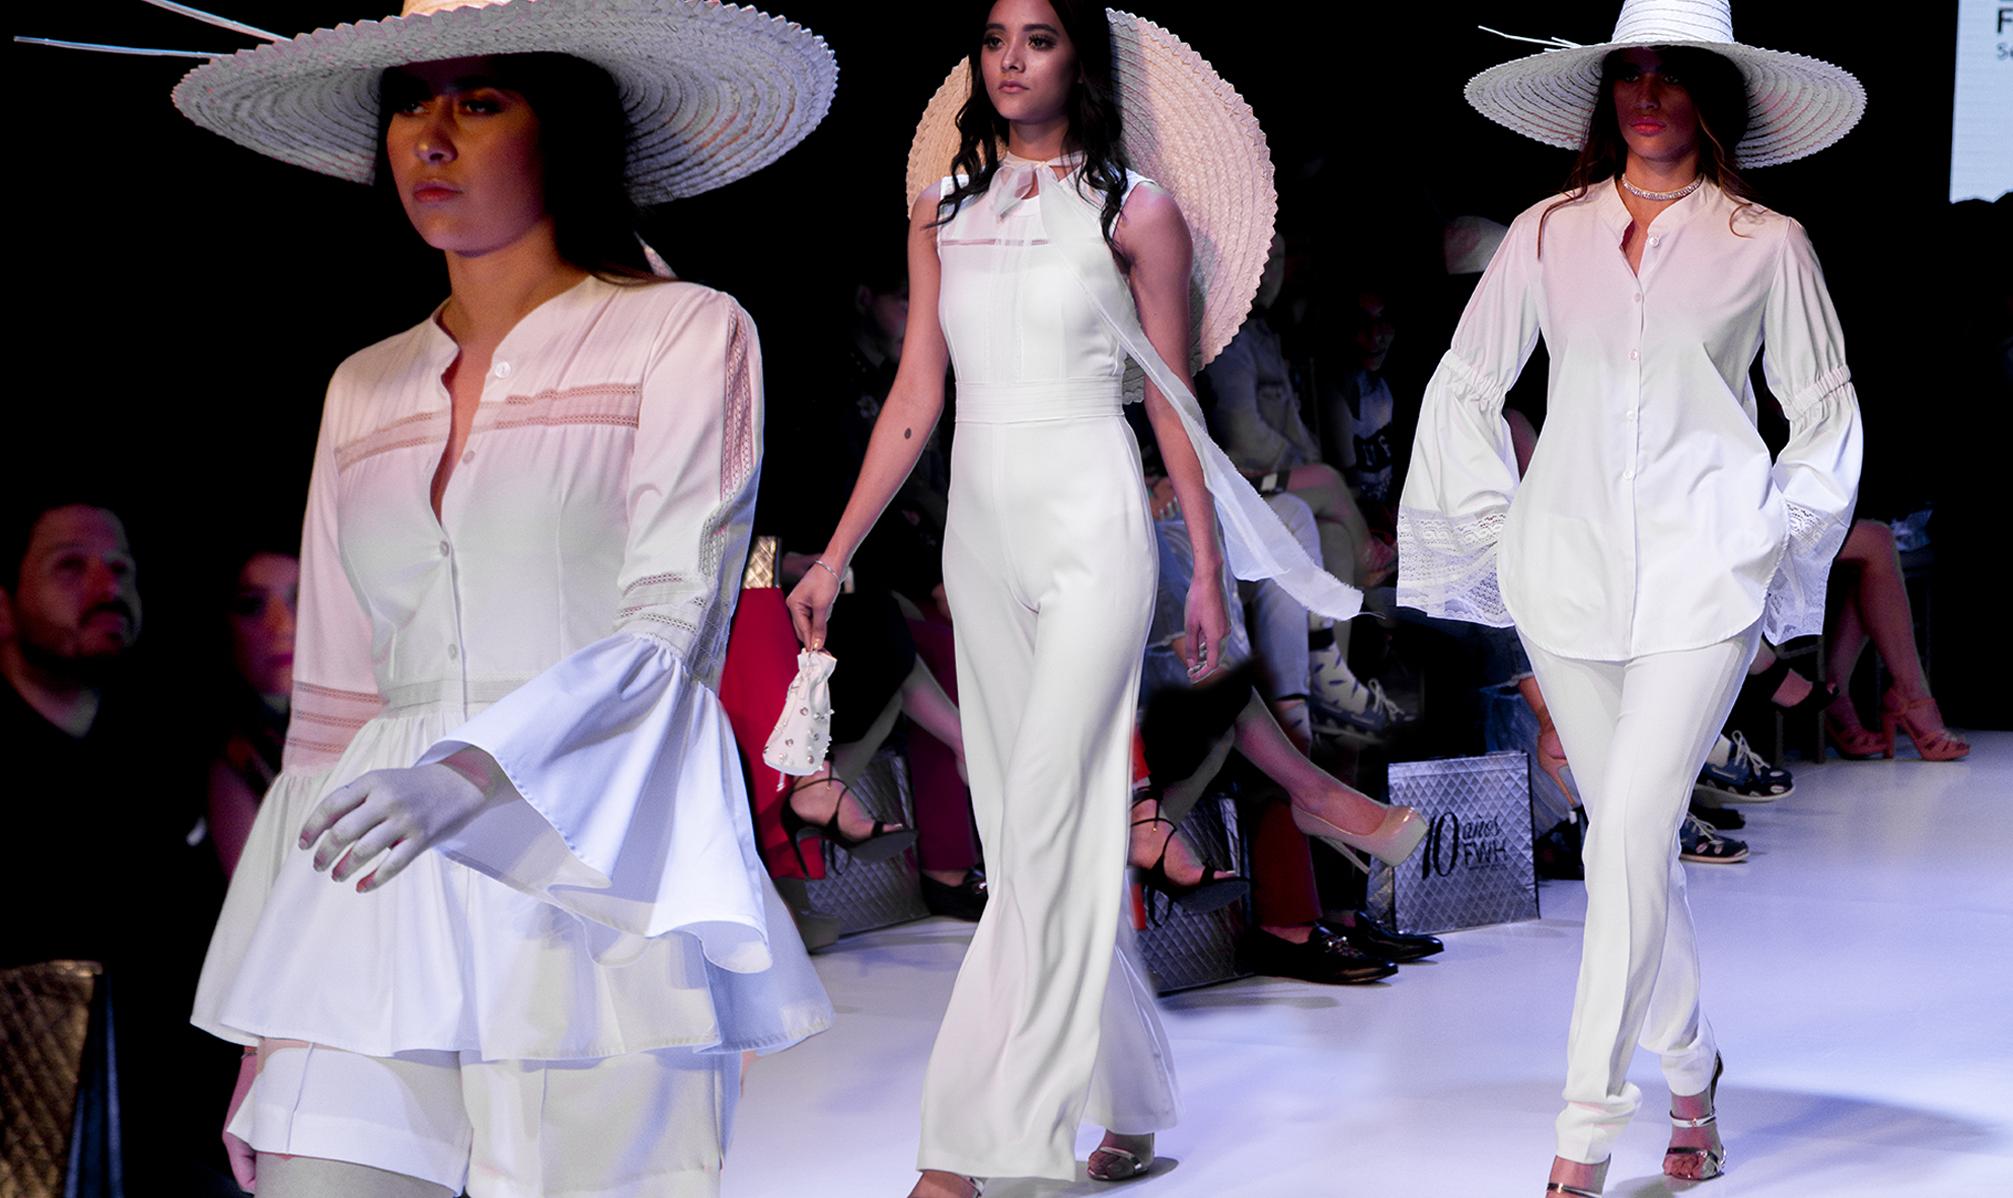 fashion week honduras lawin paz mary ann kafati tirso rubio jose vargas fashion blog blogger moda pasarela estilismo moda fashion style  fashion week honduras